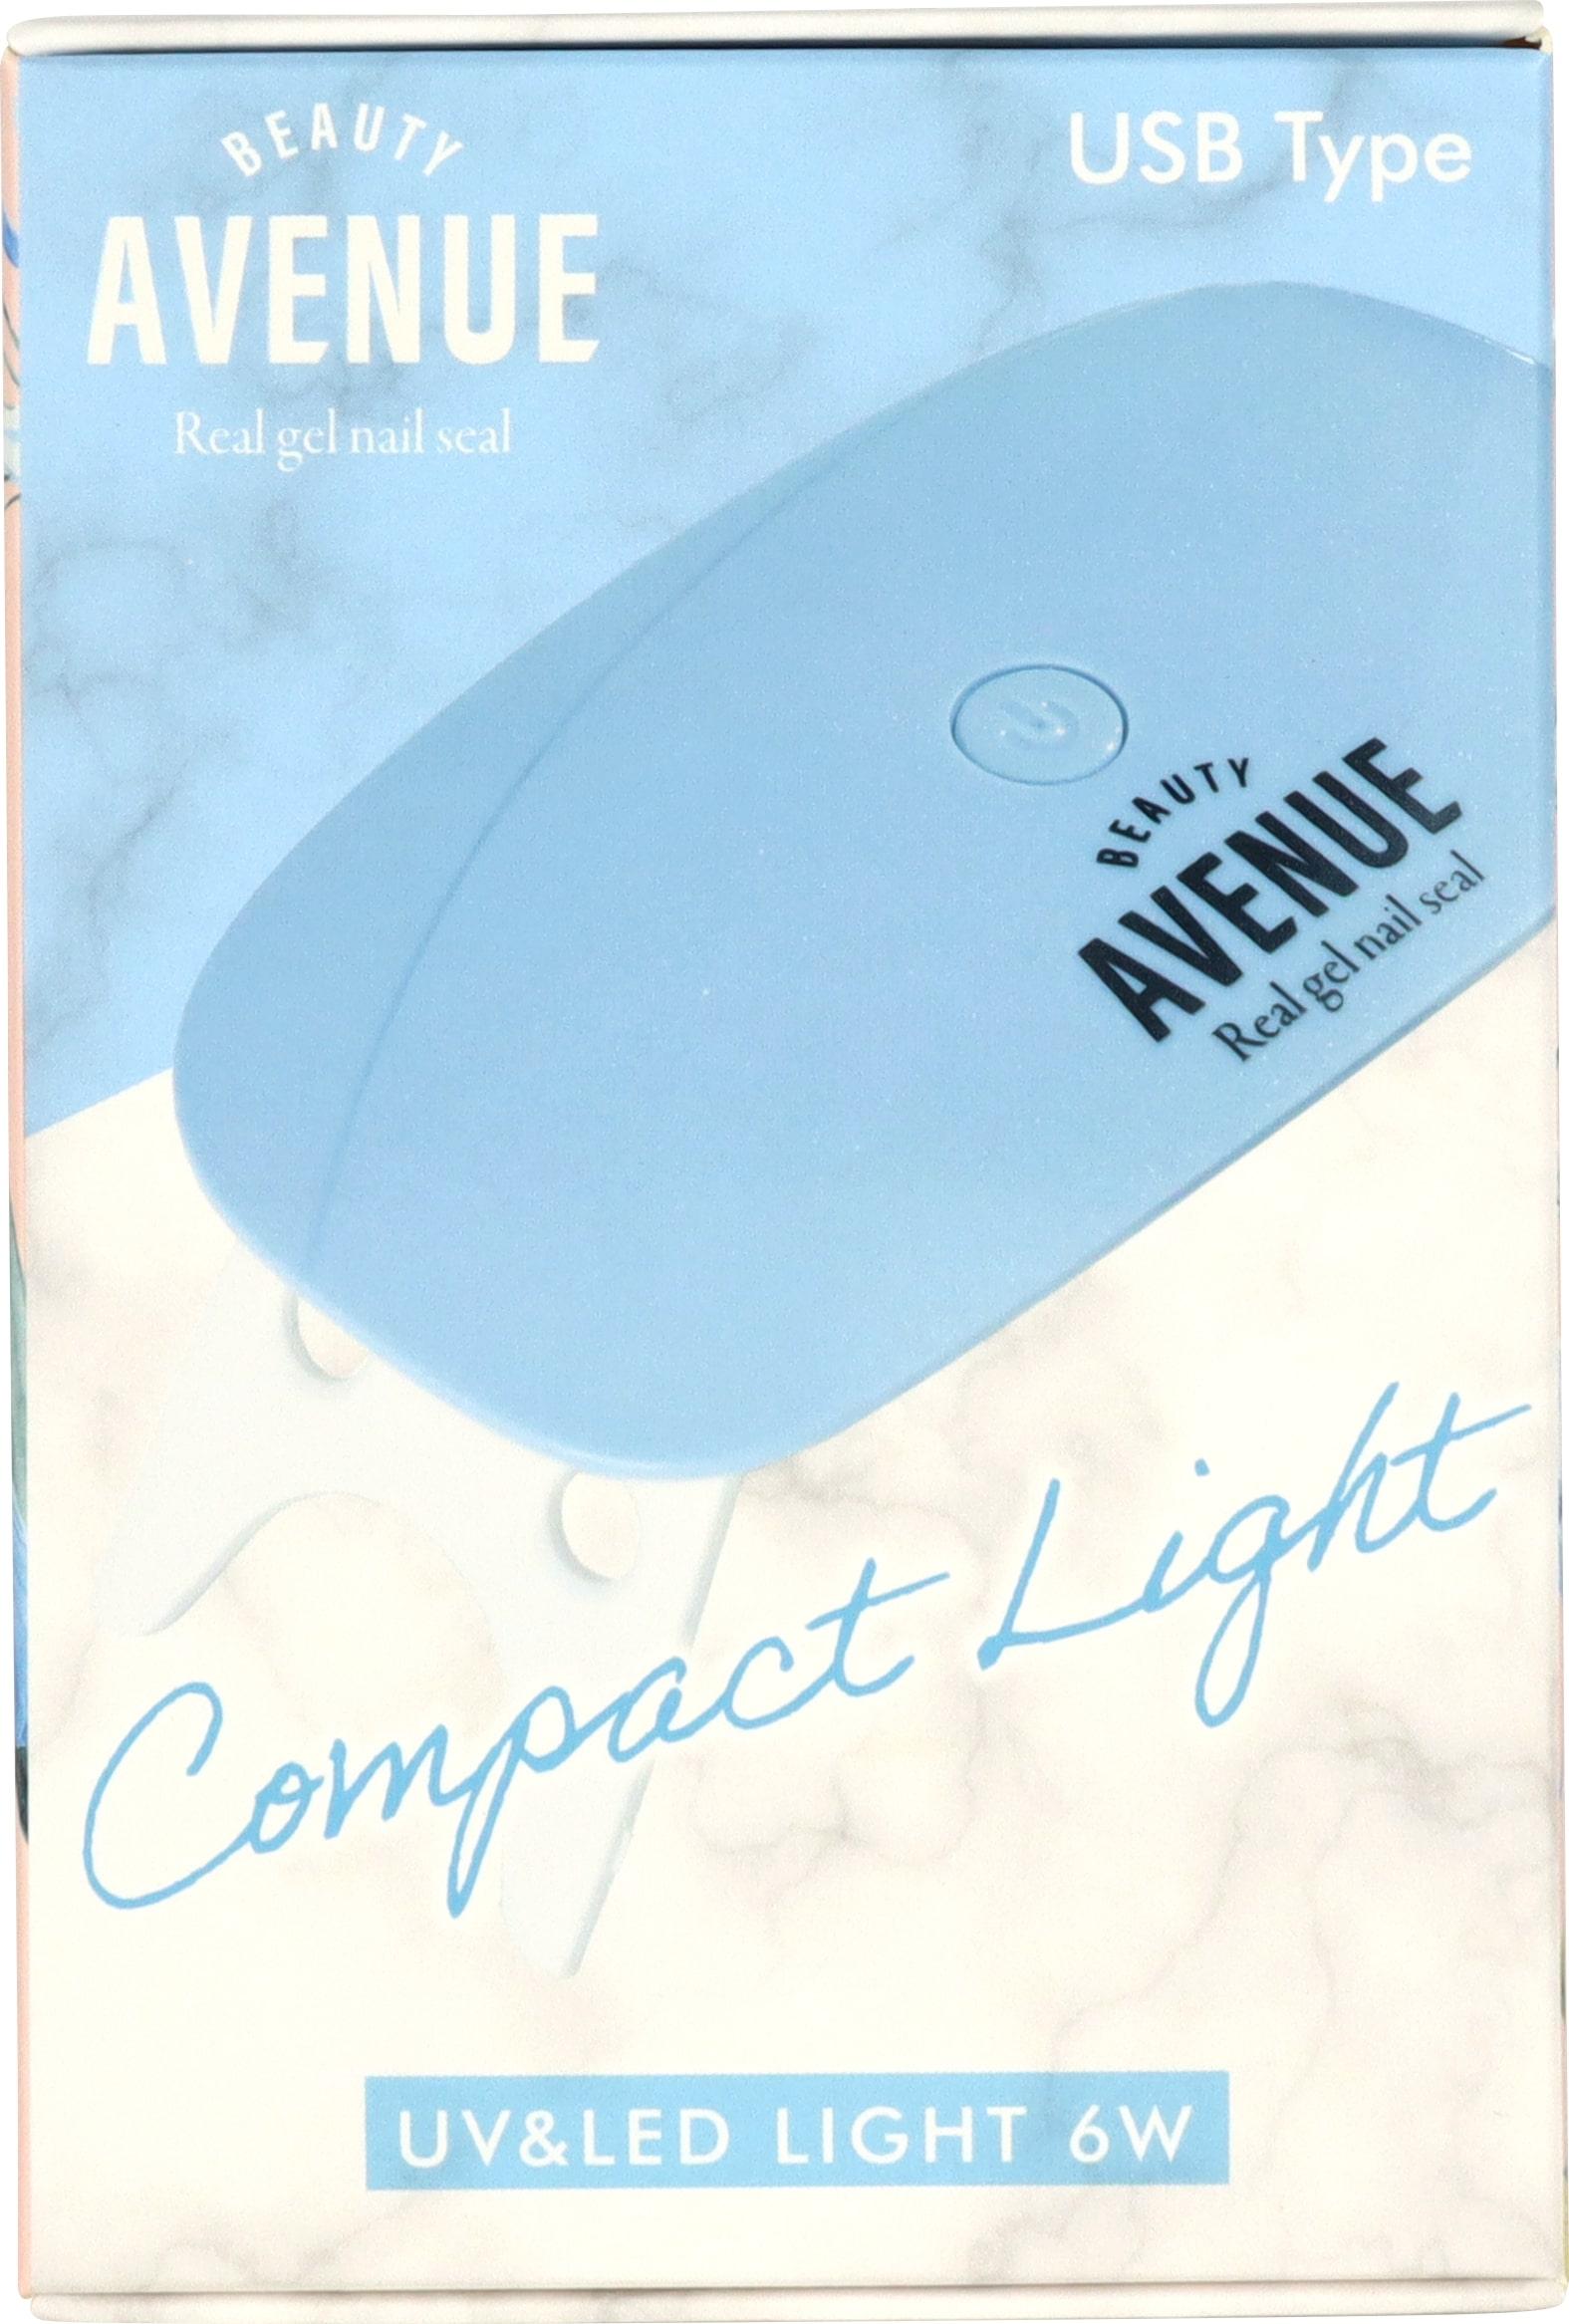 UV&LEDライトBlue(BEAUTY AVENUE)